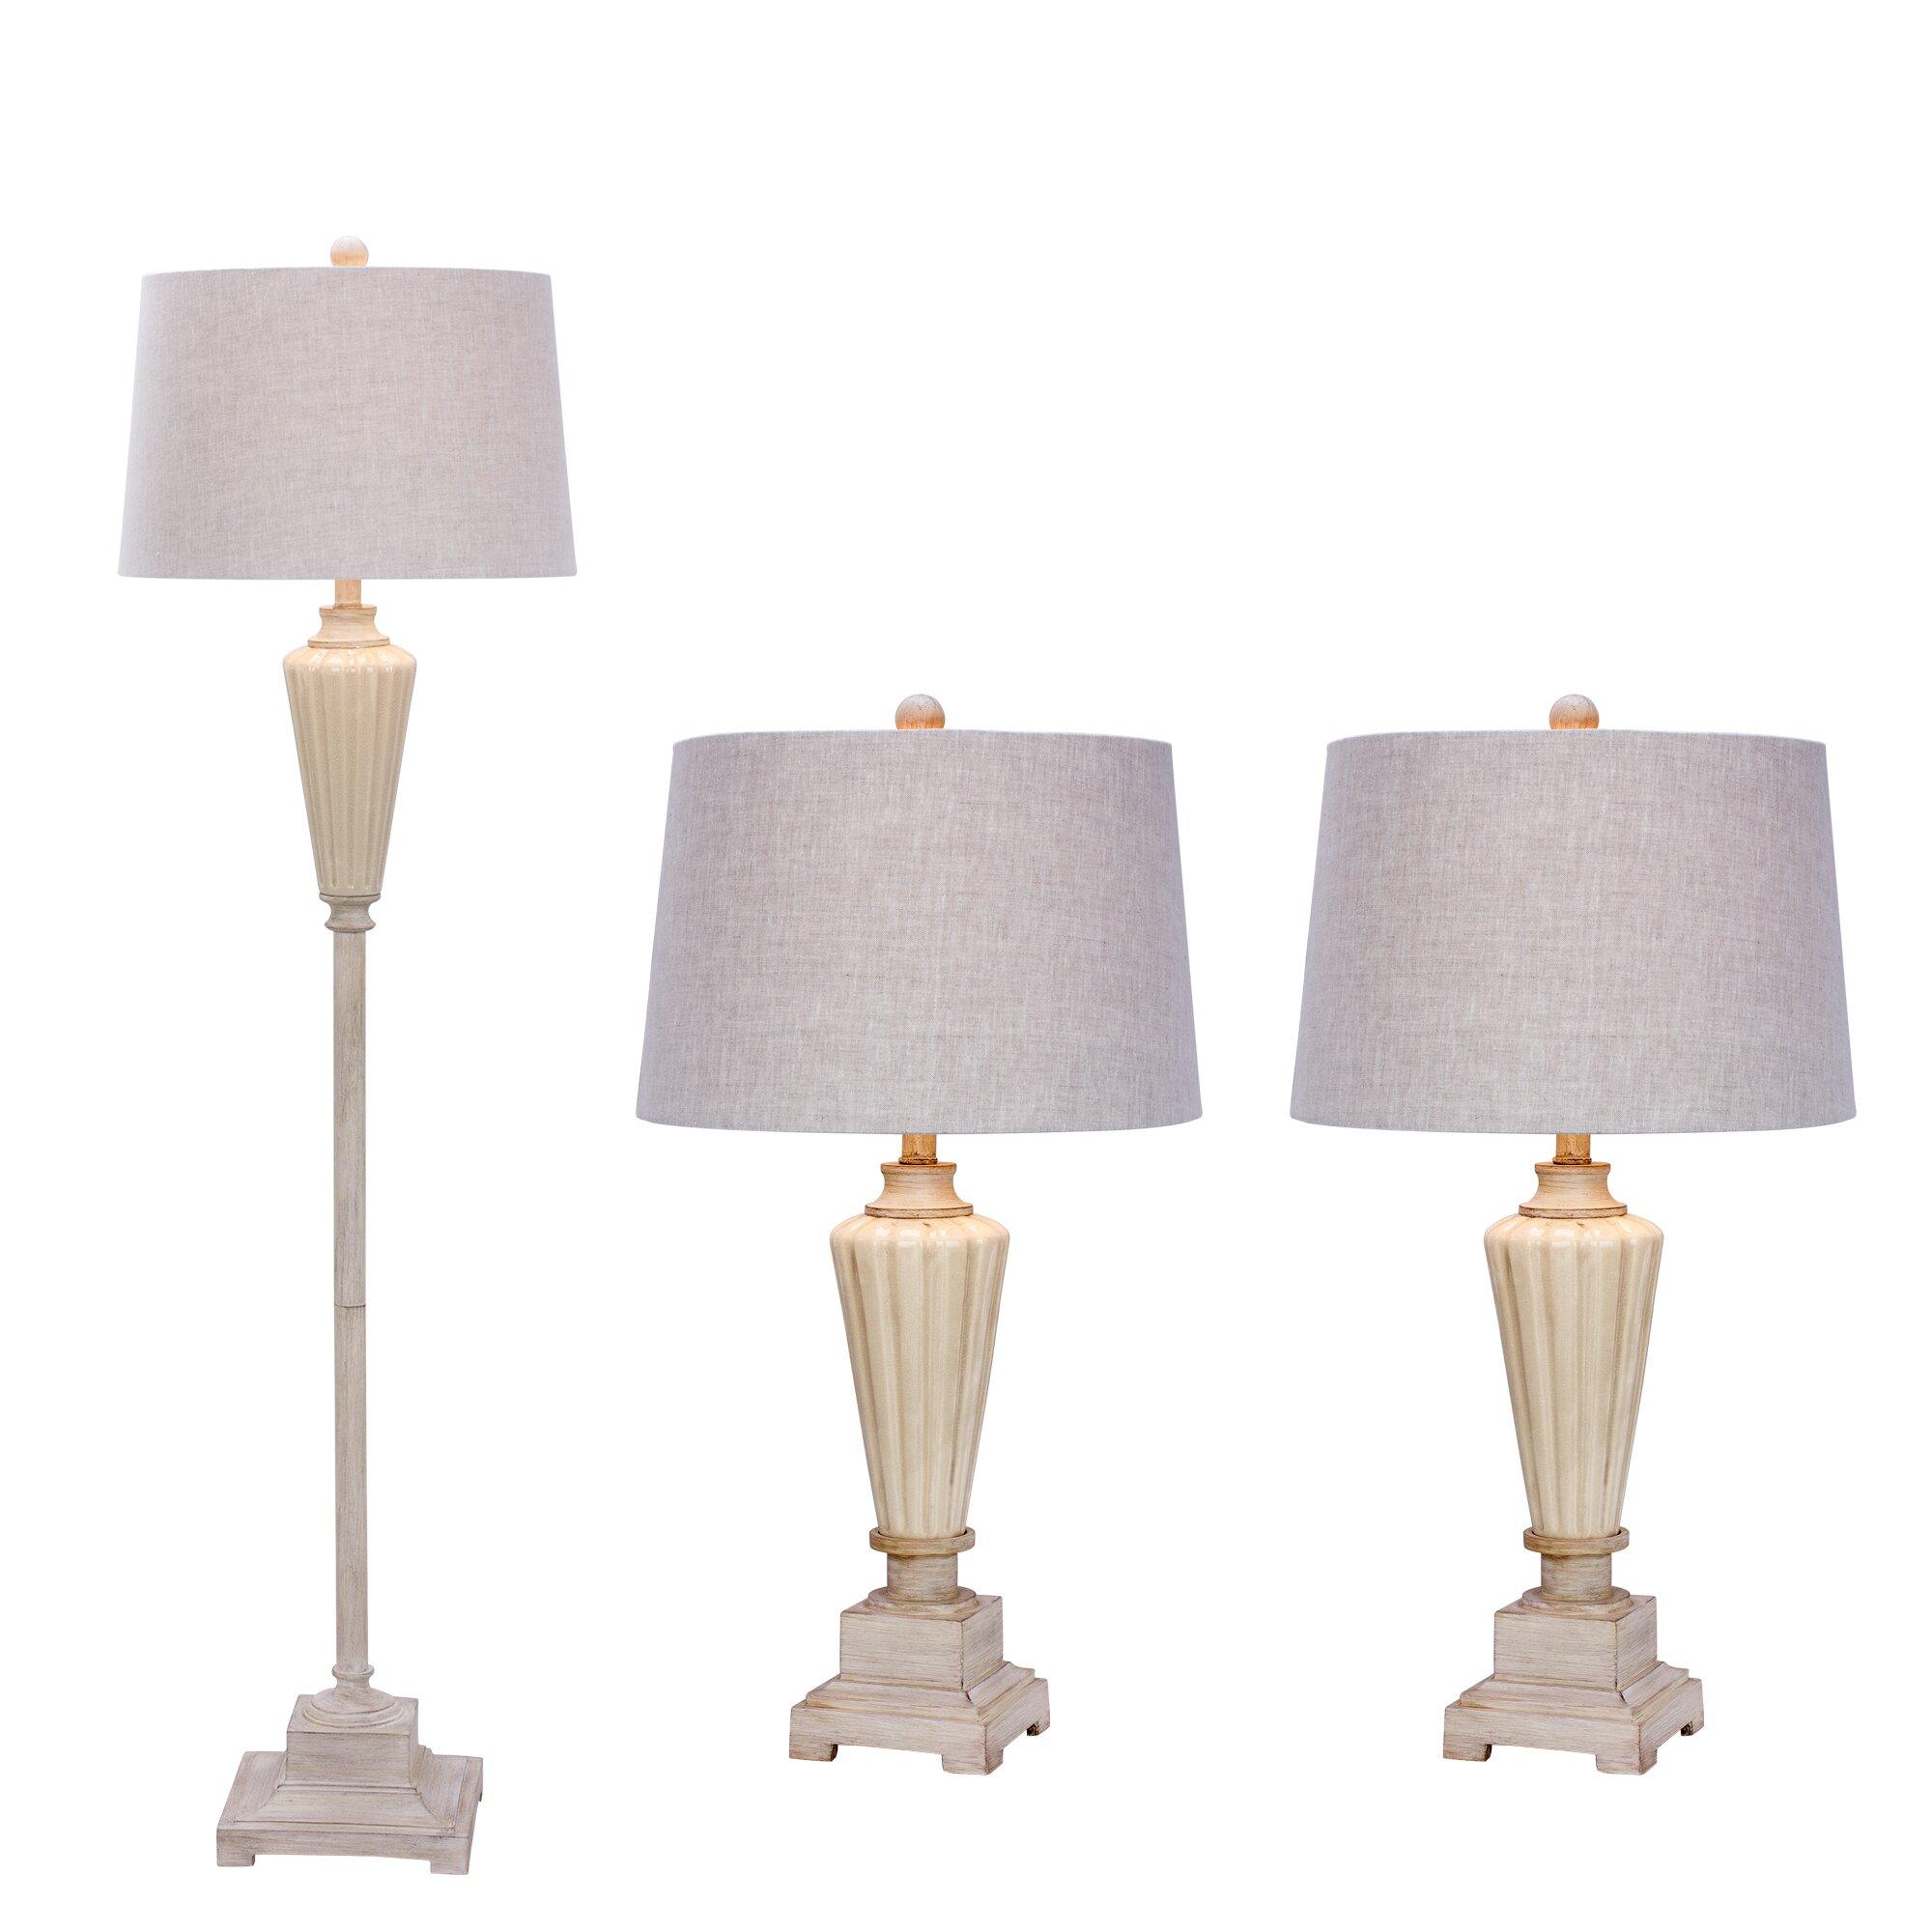 Lark manor bernard 3 piece table and floor lamp set wayfair for Floor and table lamp set uk